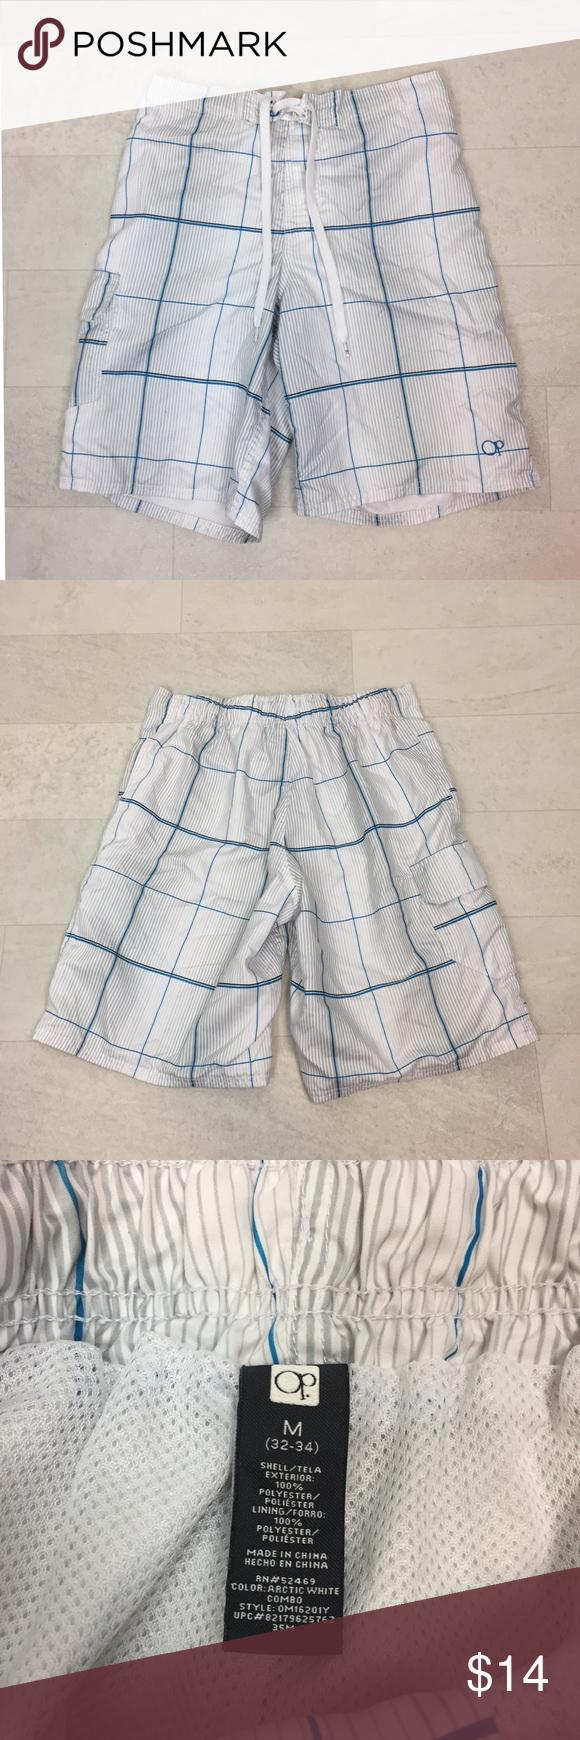 ca9cc57d95 OP Swim Trunks Sz Medium 32 34 Lined Board Shorts Ocean Pacific (OP) Swim  Suit Tie waist with velcro closure Cargo pockets Mesh lined White, blue, ...